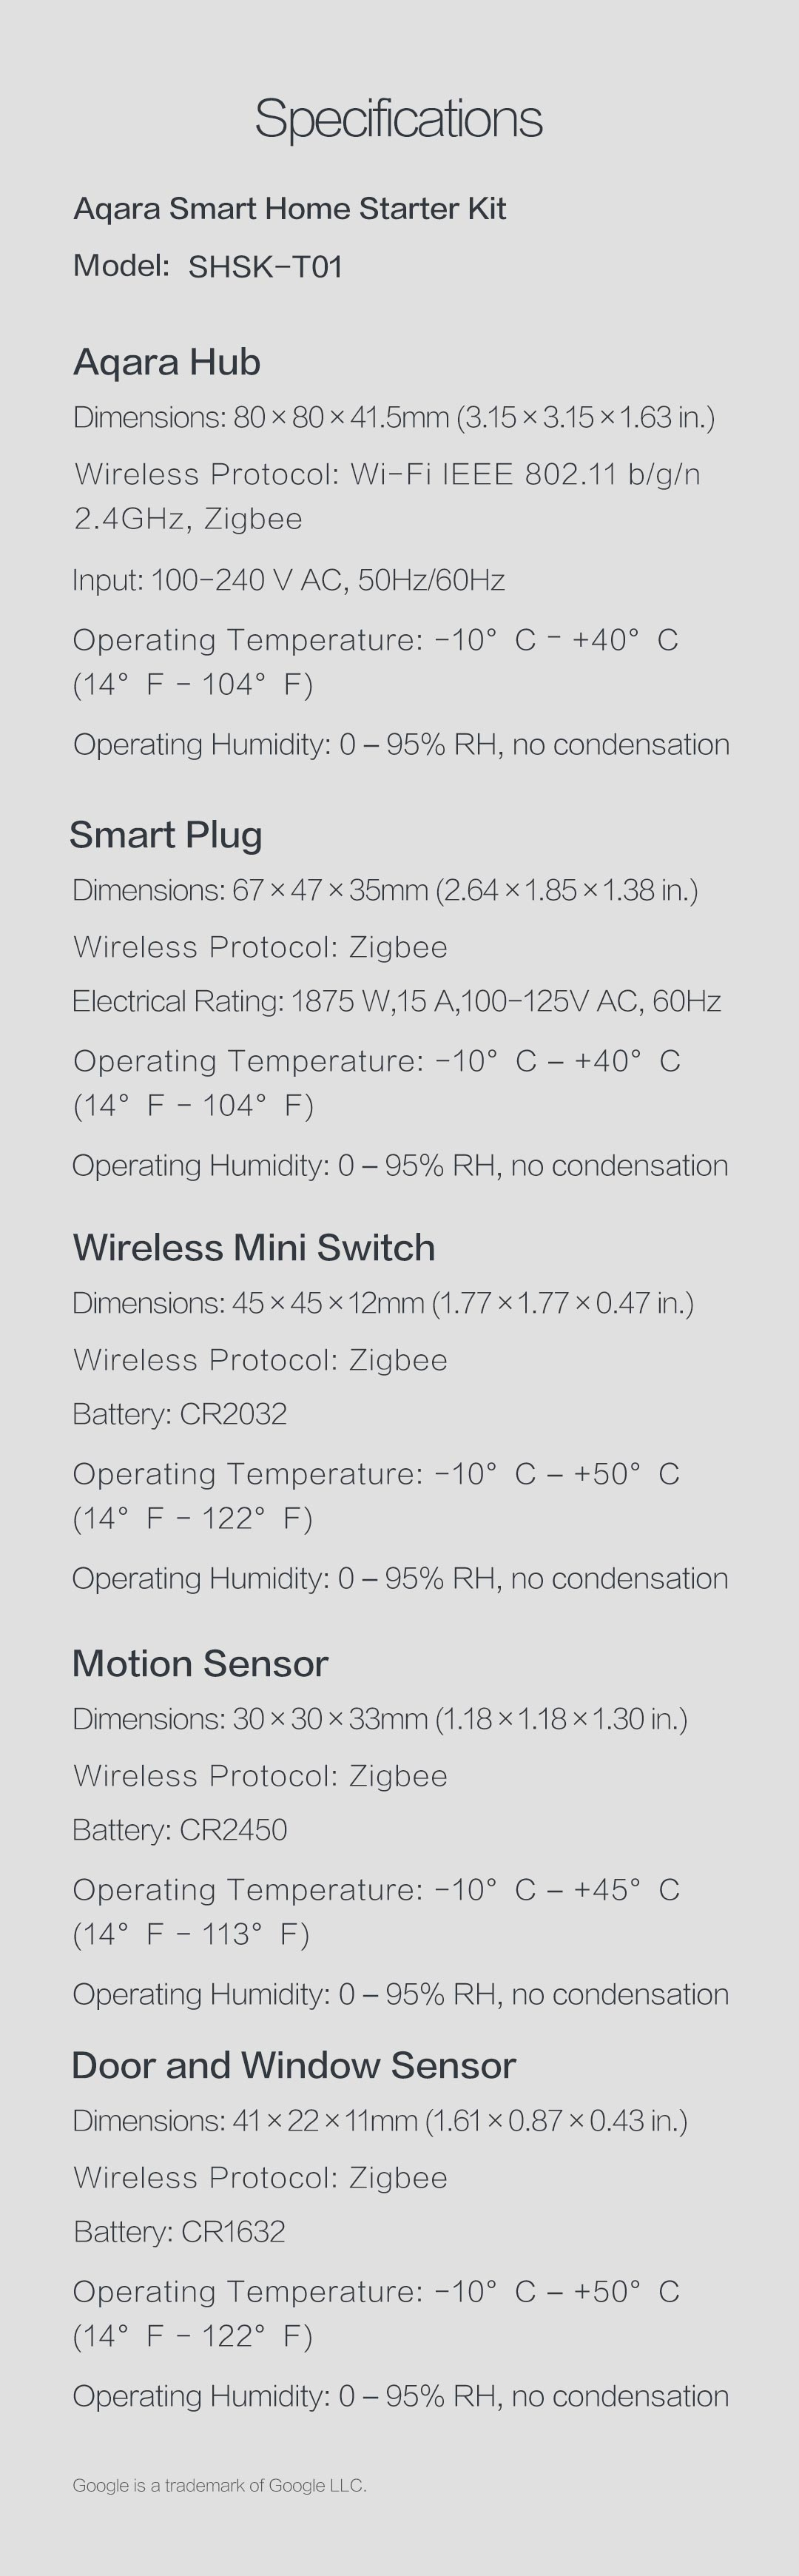 Aqara smart home starter kit specifications